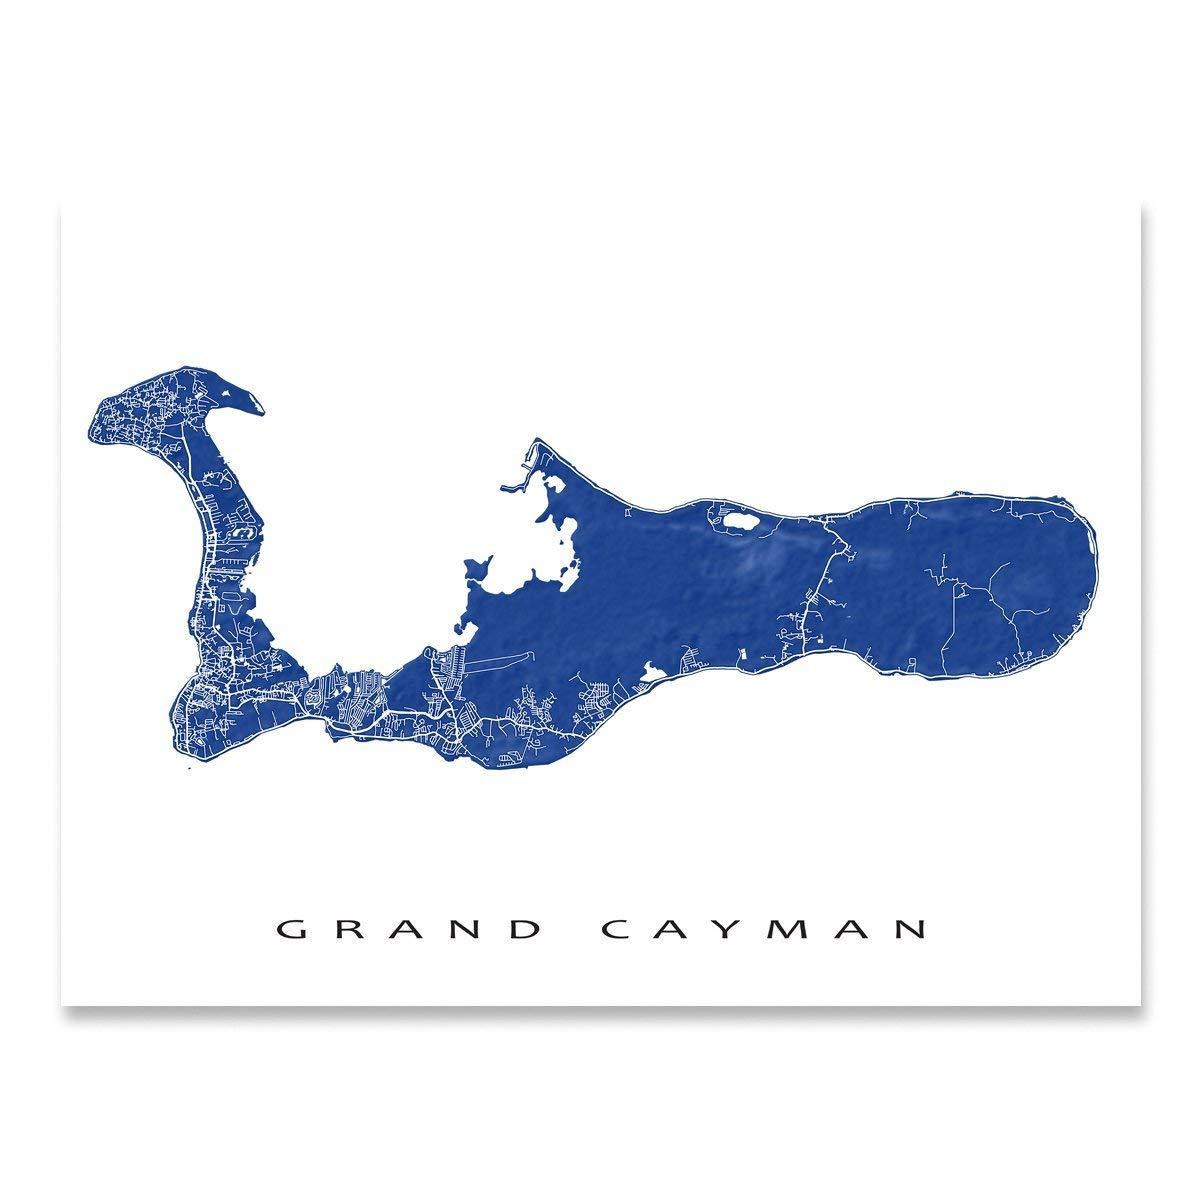 Grand Cayman Map Art Print Wall Artwork Poster Caribbean Island